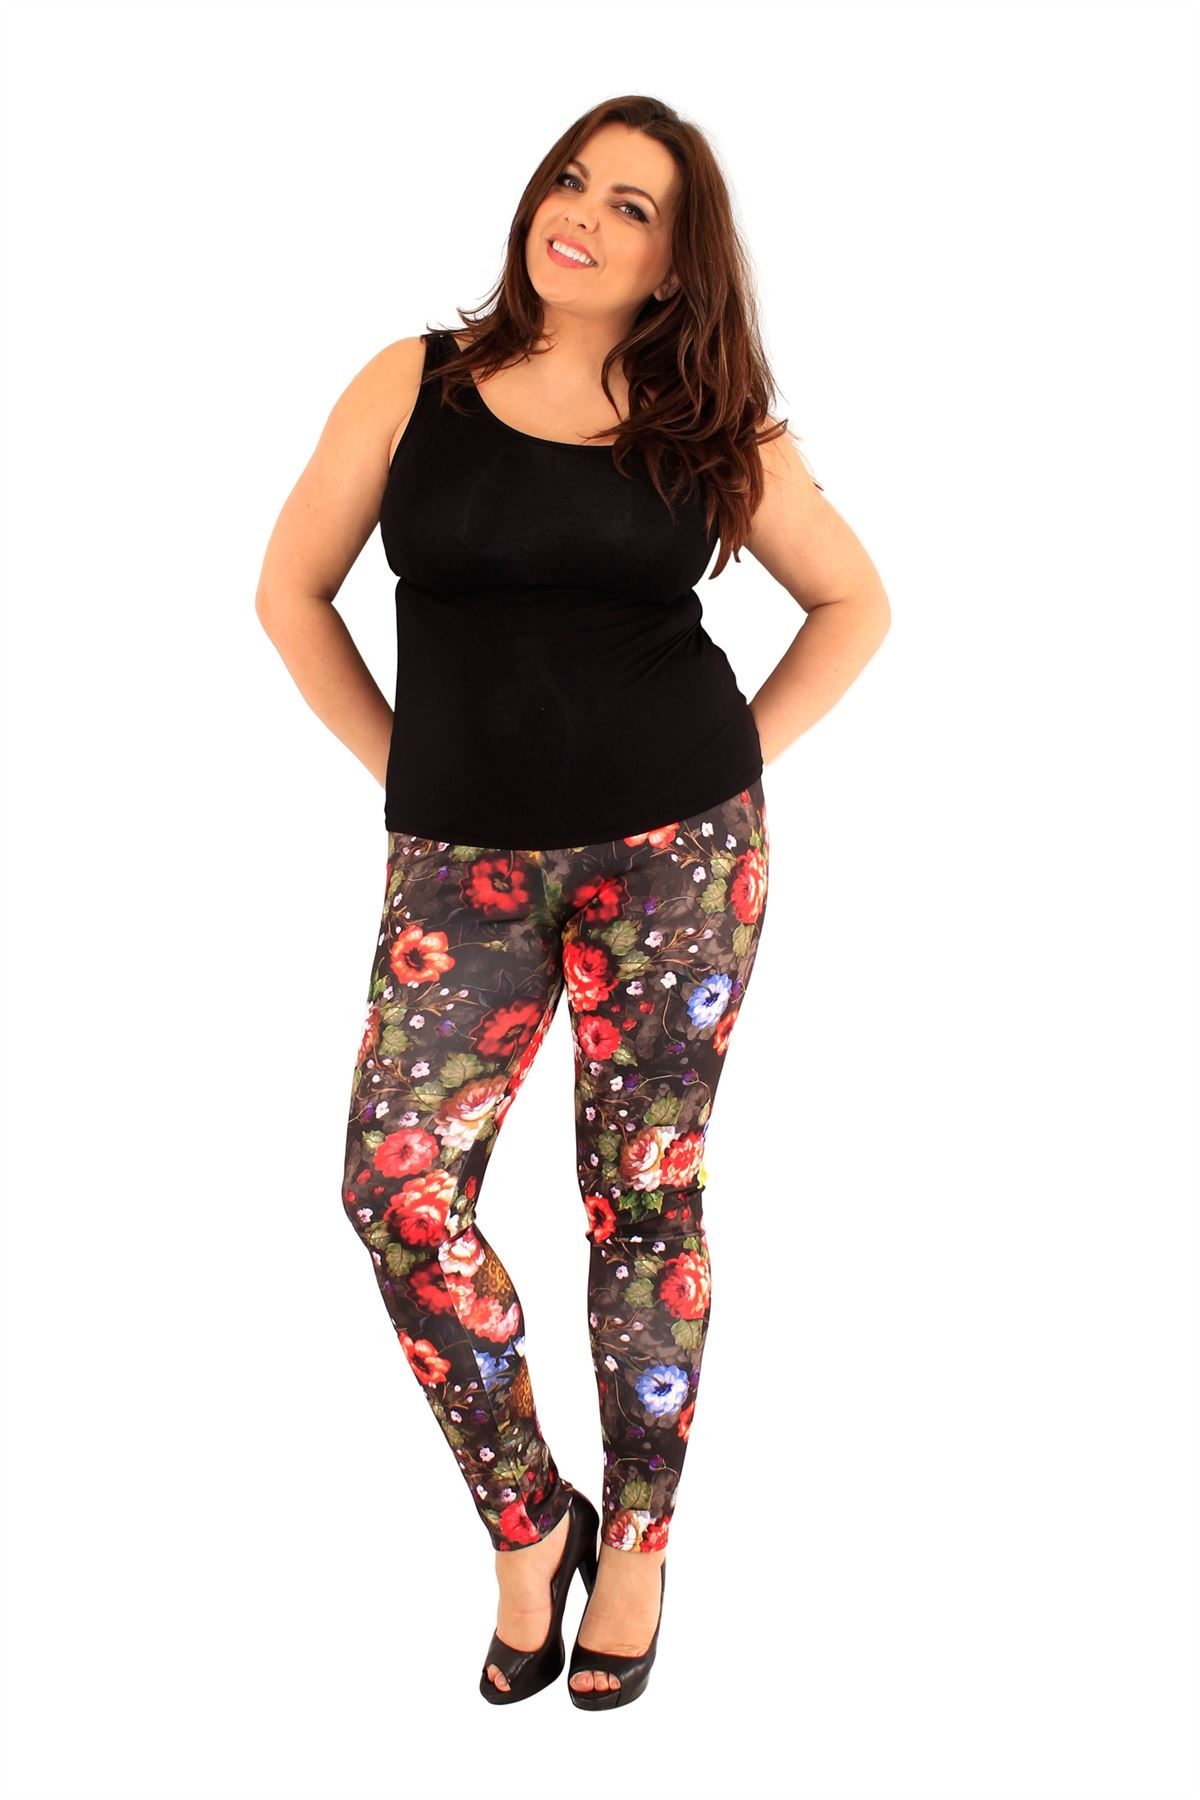 Simple Bogner Lene Printed Ski Pants (For Women) 9793W - Save 57%